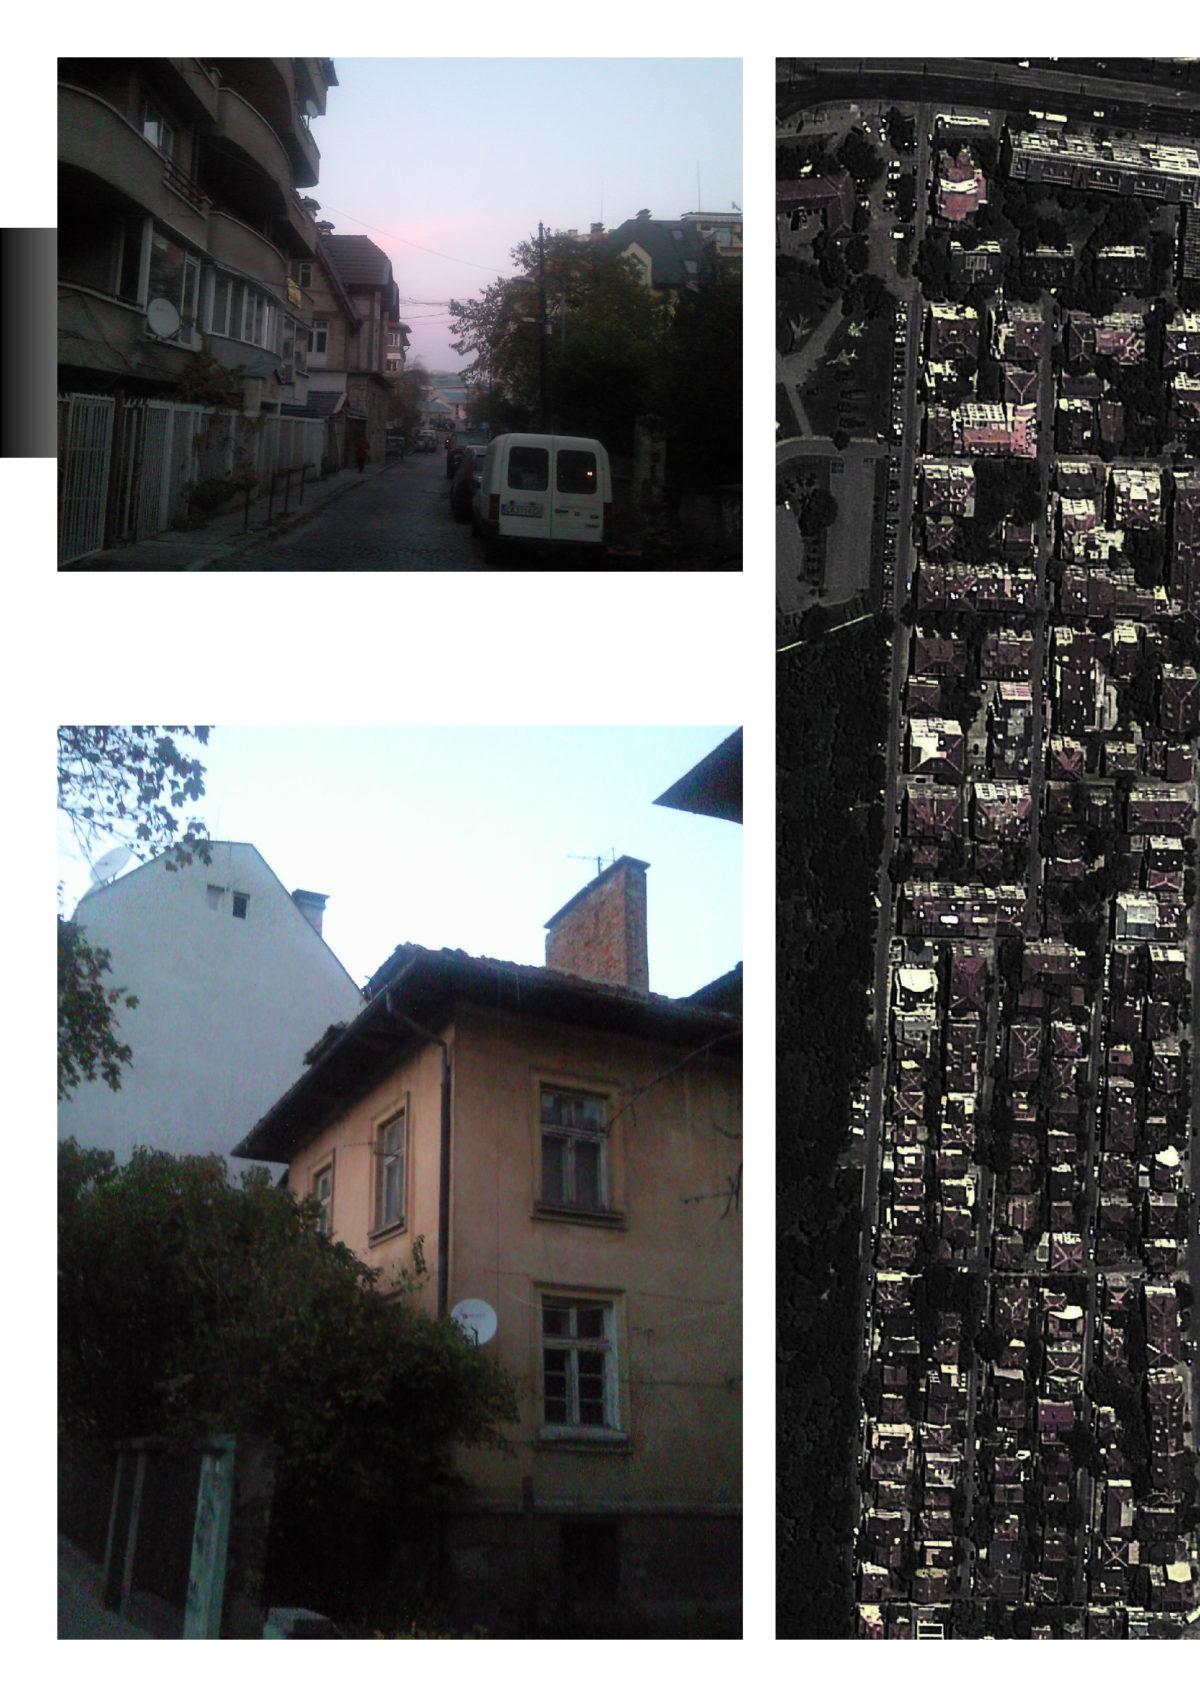 http://www.petkovstudio.com/bg/wp-content/uploads/2011/02/ivanasen_Page_16-1200x1697.jpg